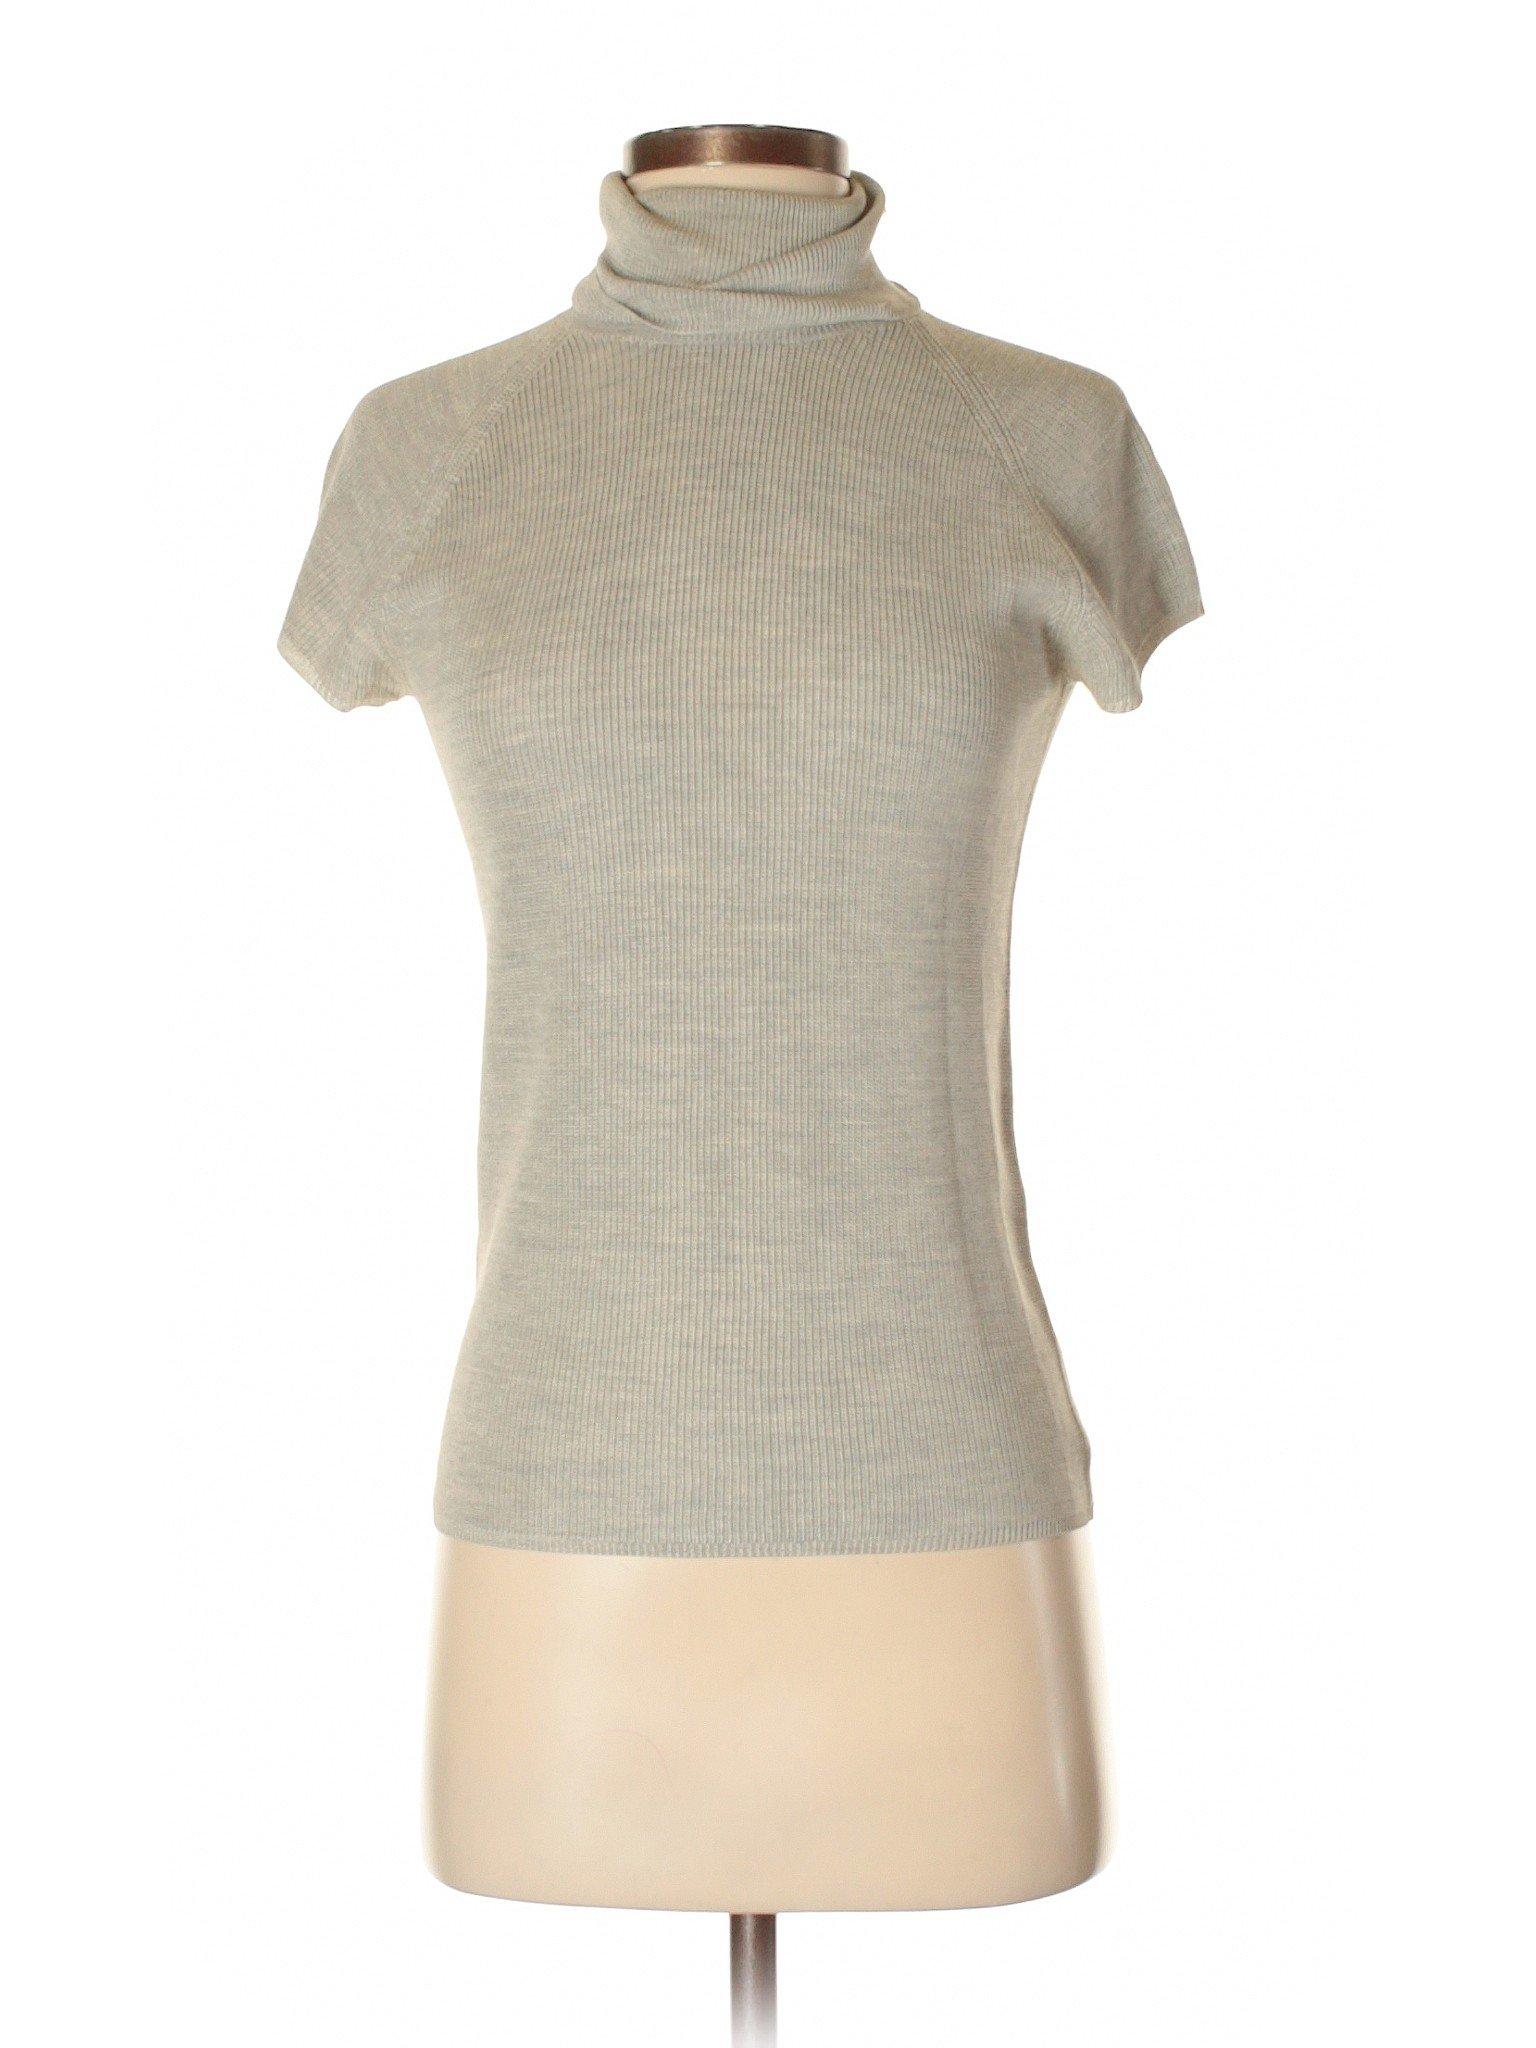 Boutique Isaac York Silk Pullover Sweater New Mizrahi ZwS1AZpxq